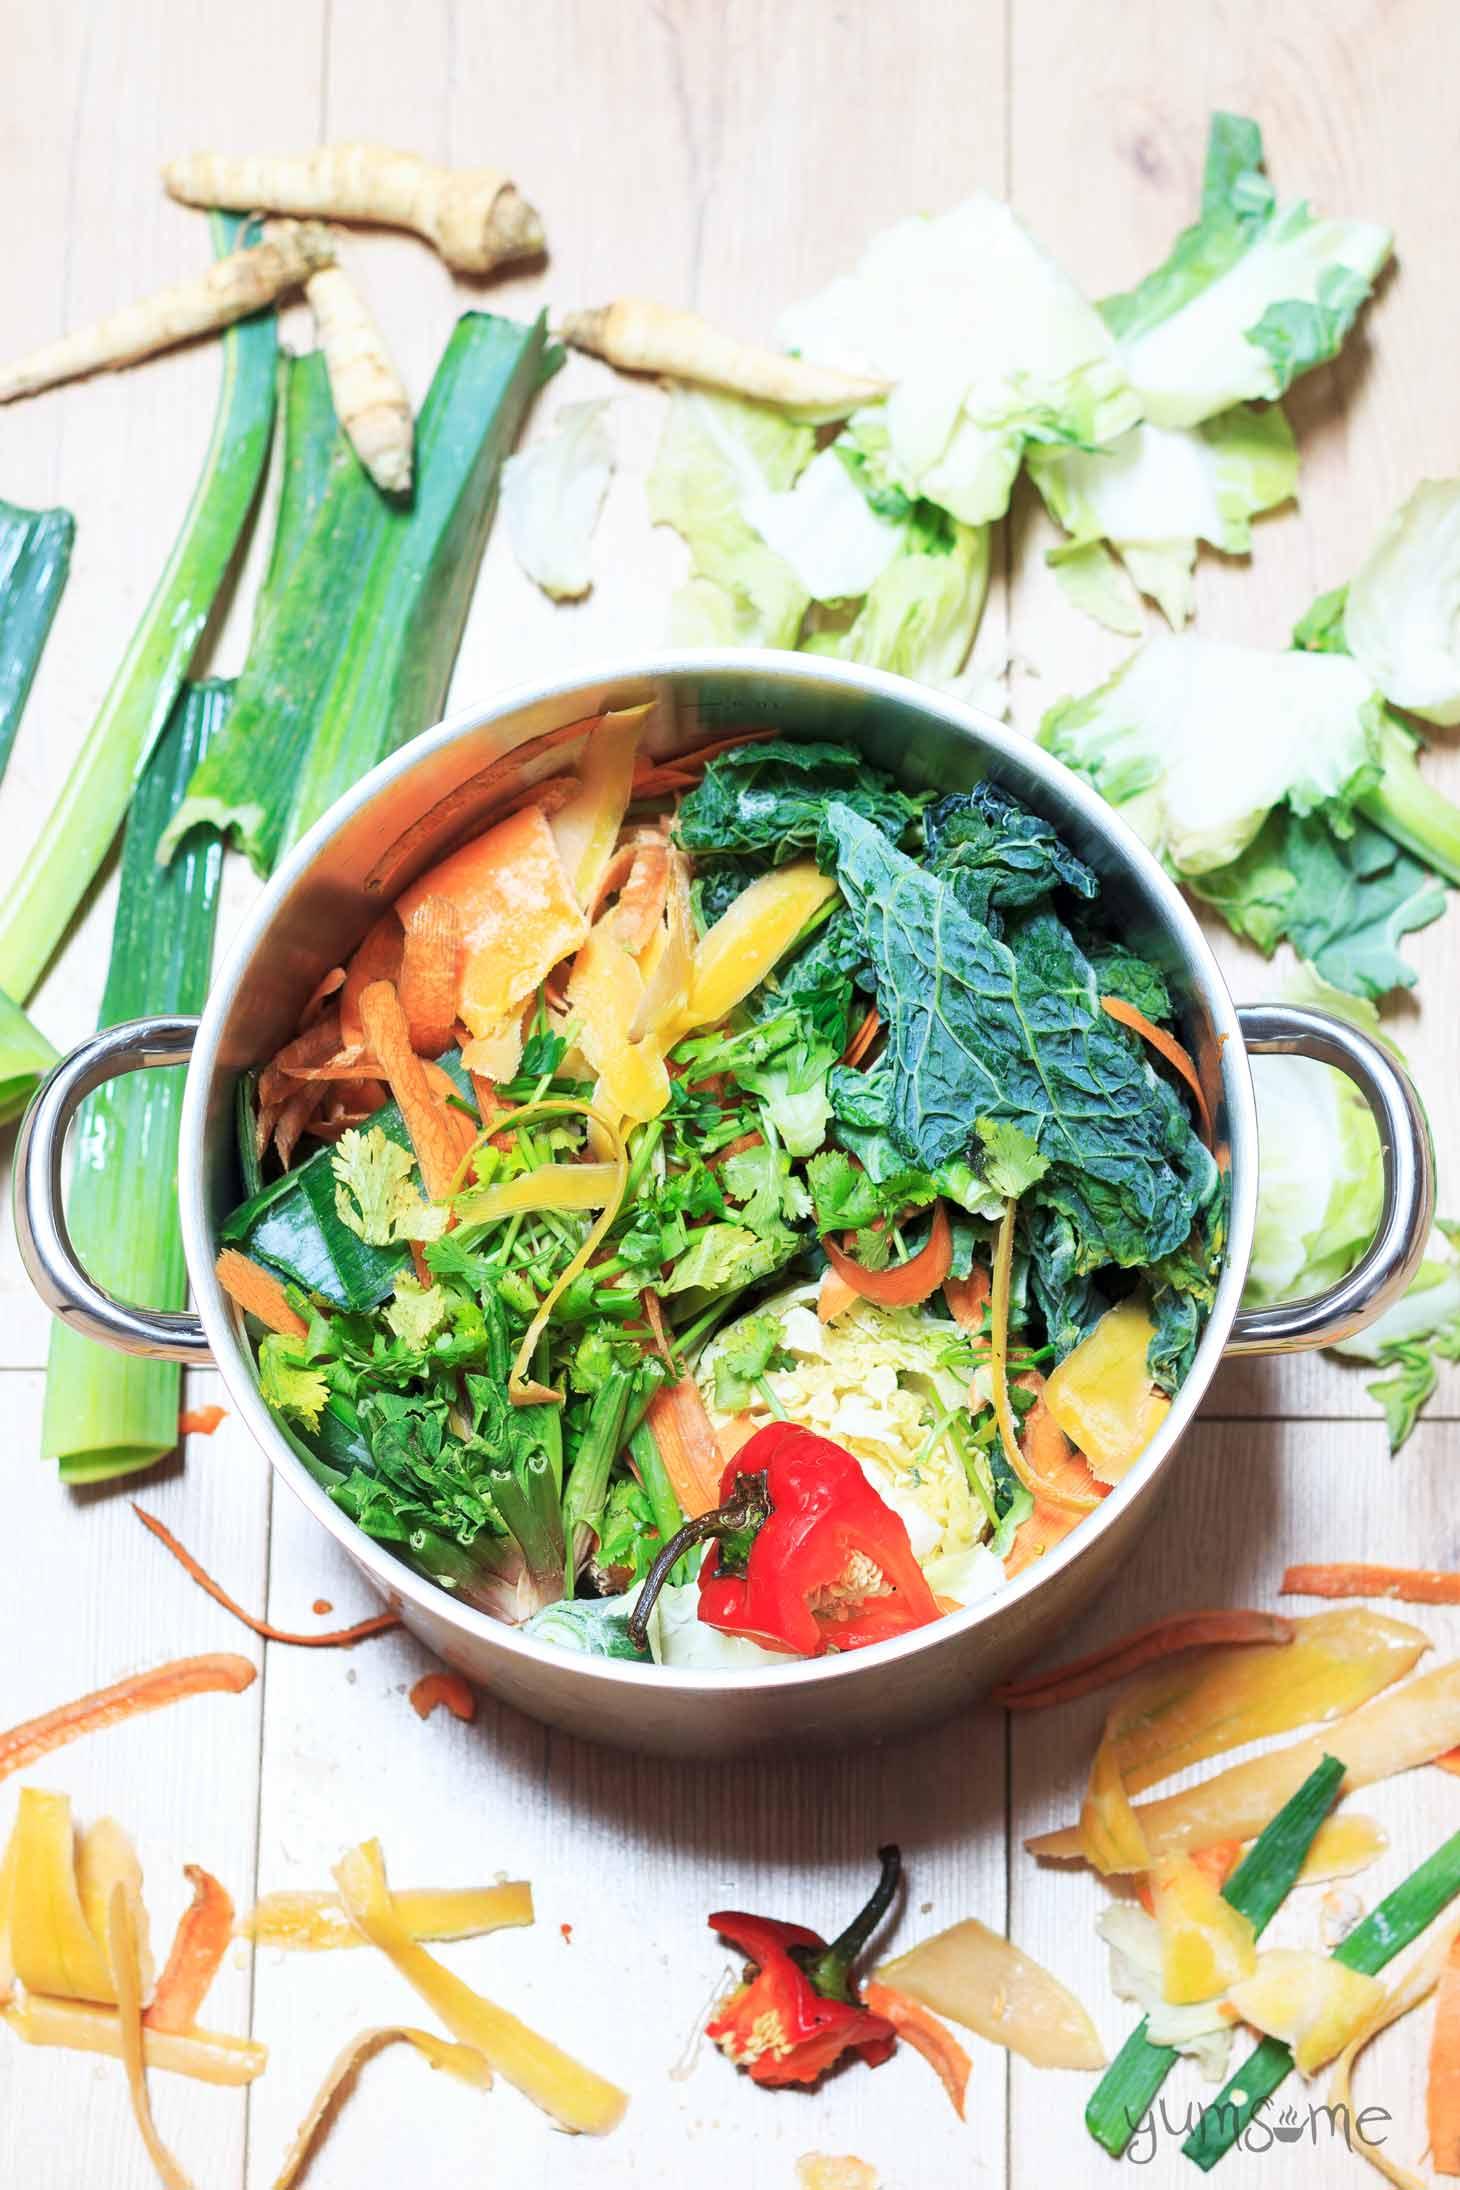 Homemade vegetable stock | yumsome.com